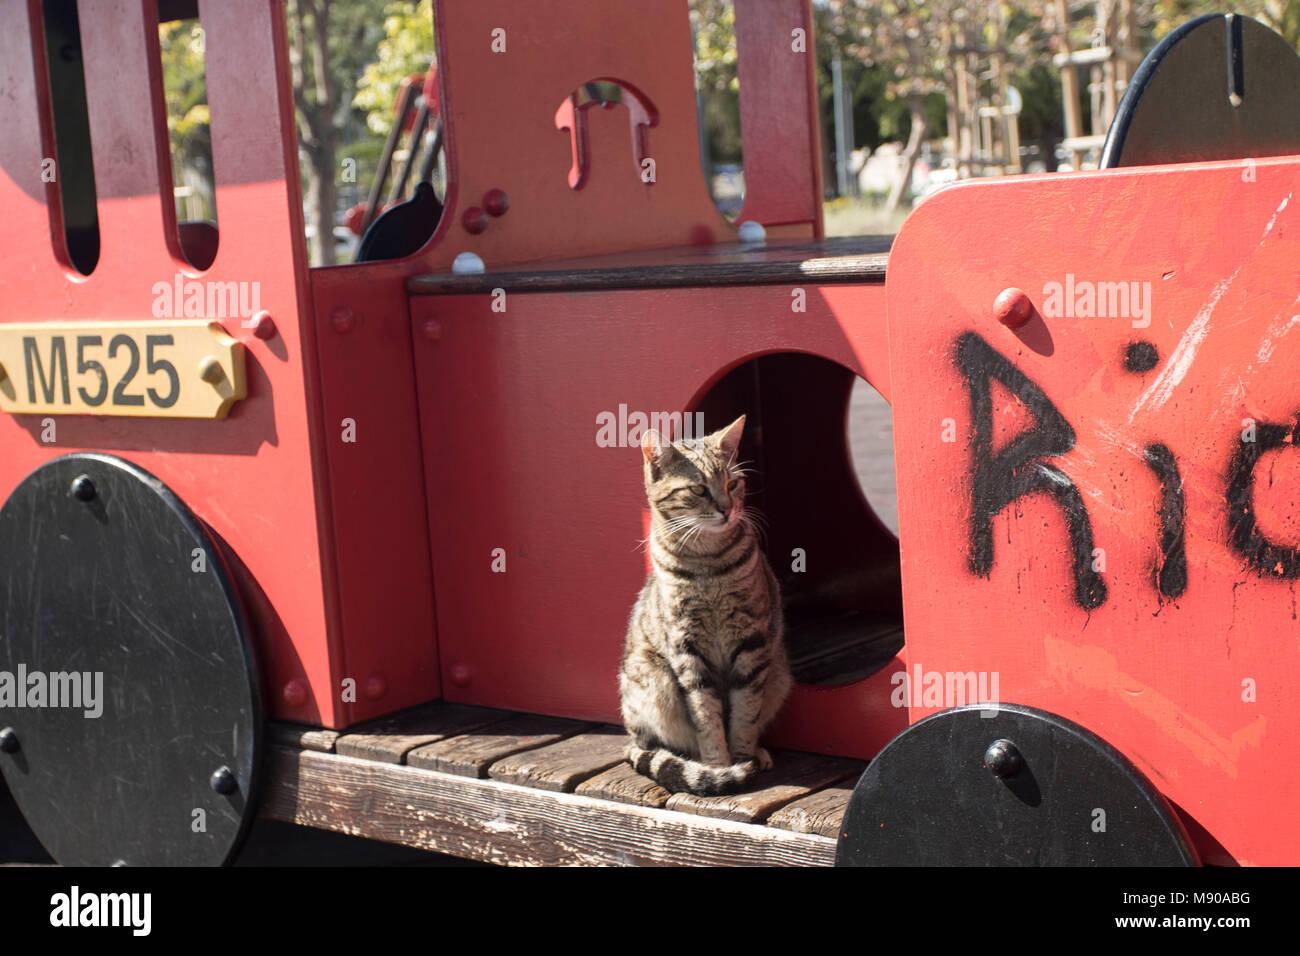 Cat on red playground train the limassol Municipal gardens in spring, Limmasol, Cyprus, Mediterranean - Stock Image